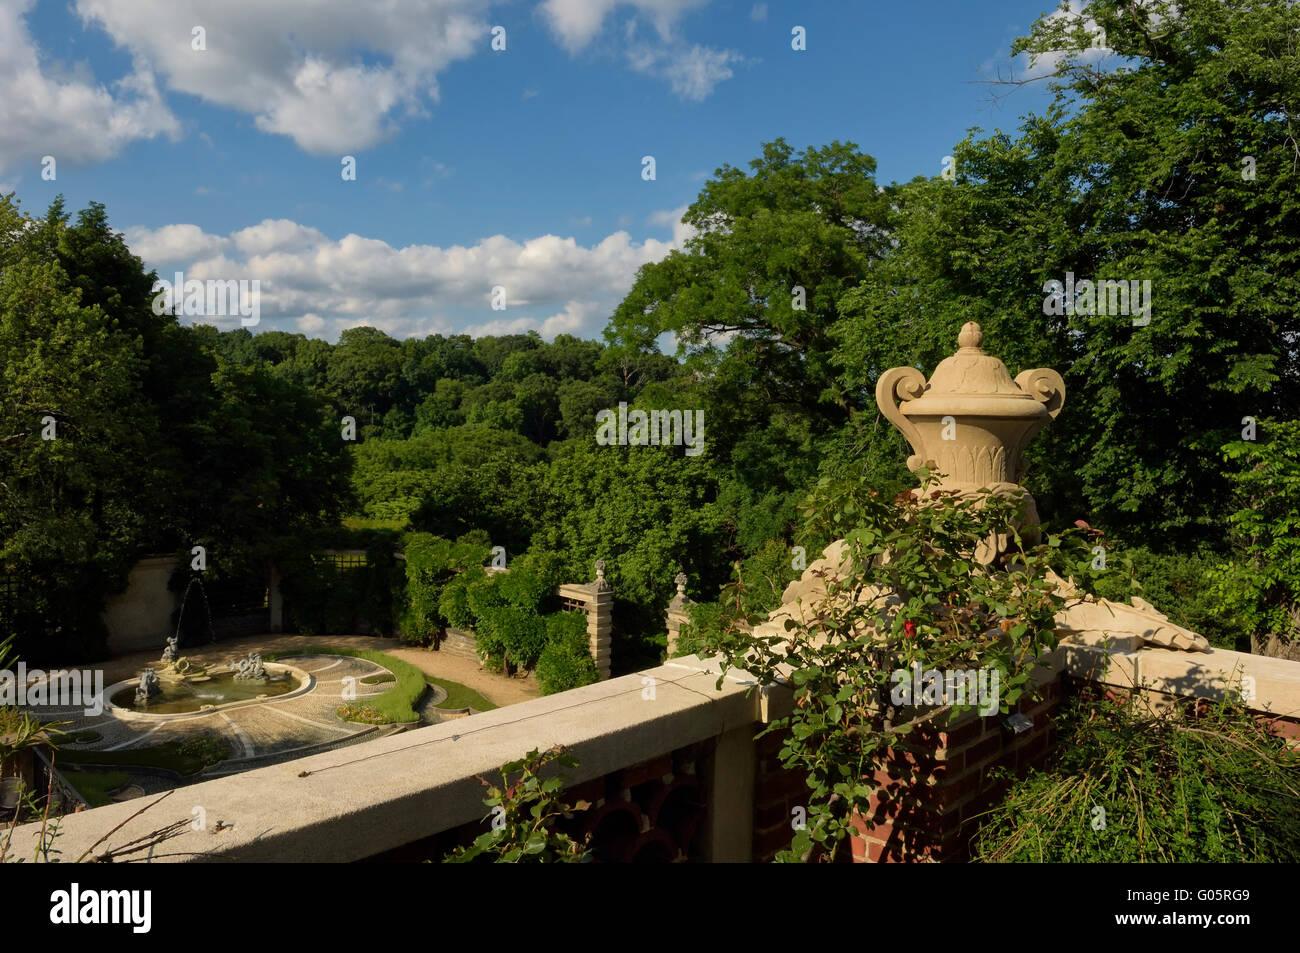 The Gardens at Dumbarton Oaks. Washington, DC. USA - Stock Image